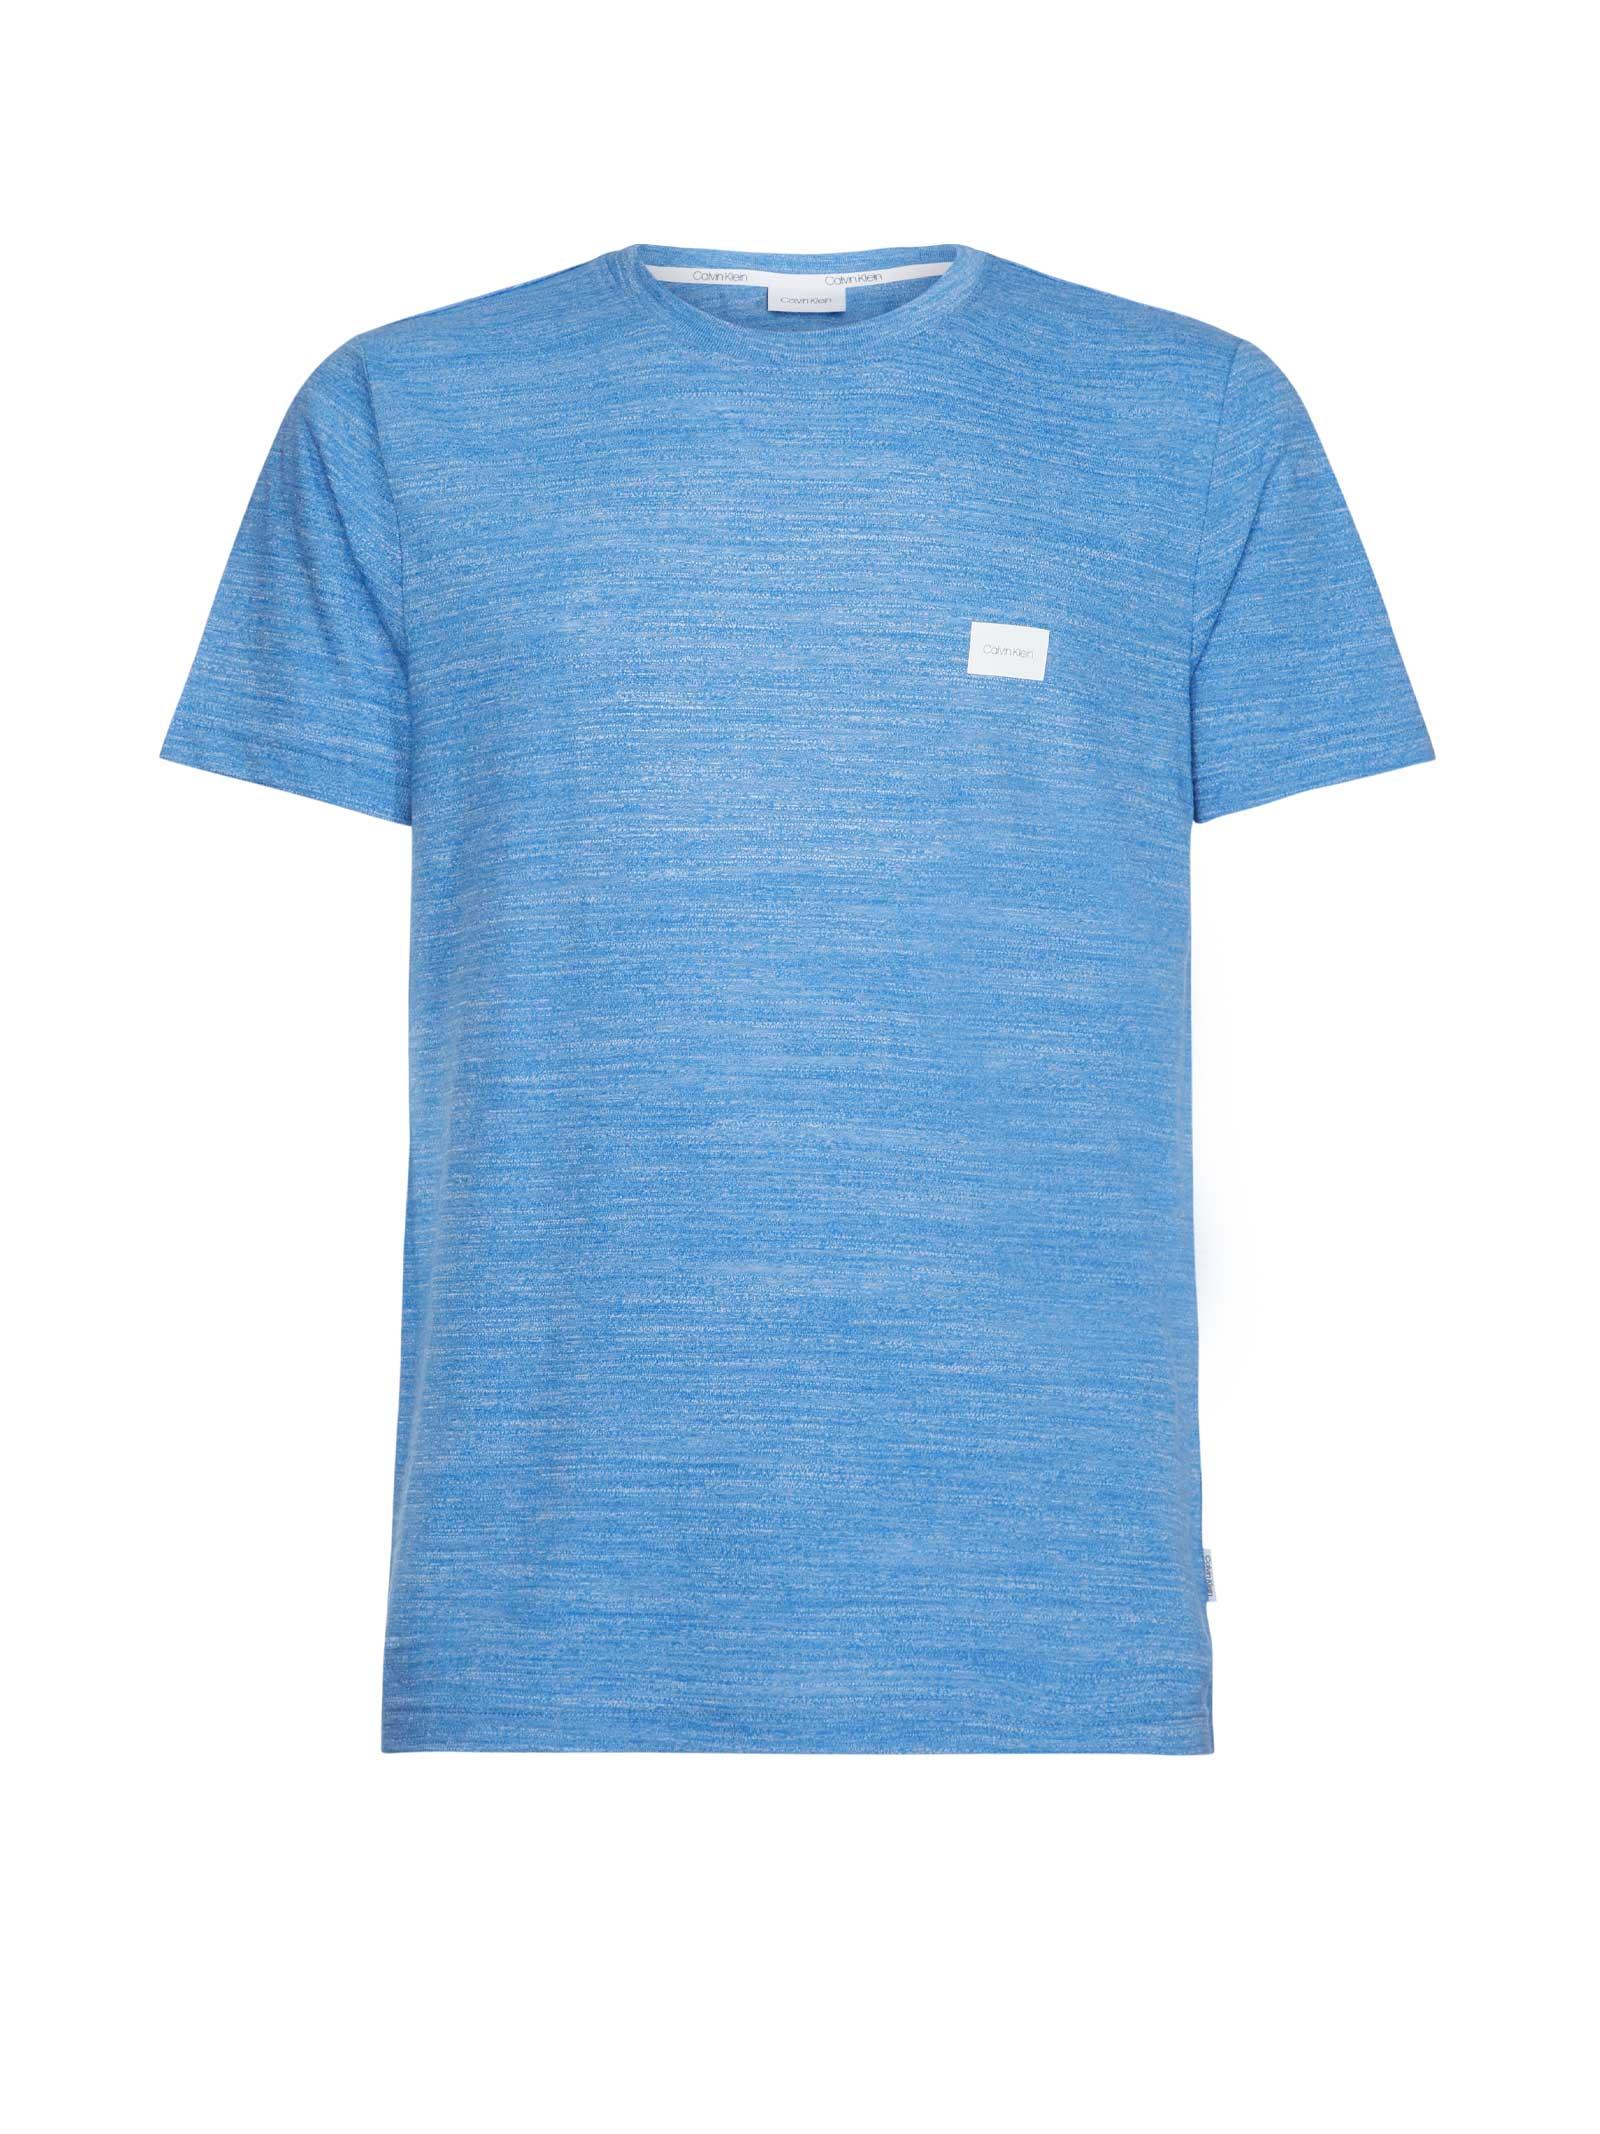 Calvin Klein Calvin Klein Logo Patch T-shirt